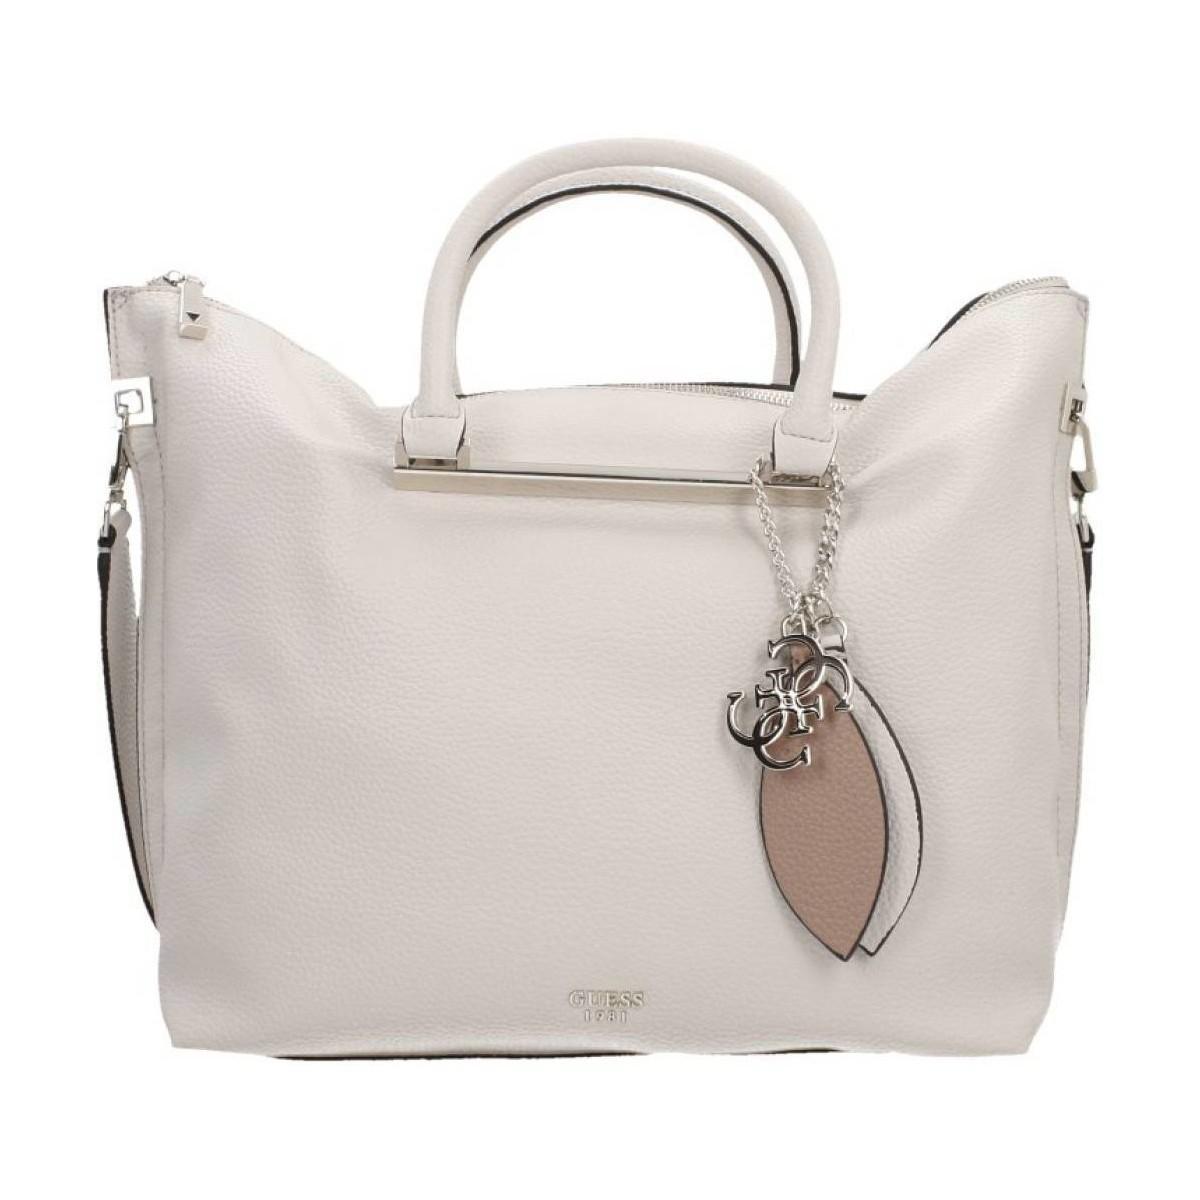 462ec0aa169b Guess Lou Lou Large Satchel Women s Bag In Beige in Natural - Lyst